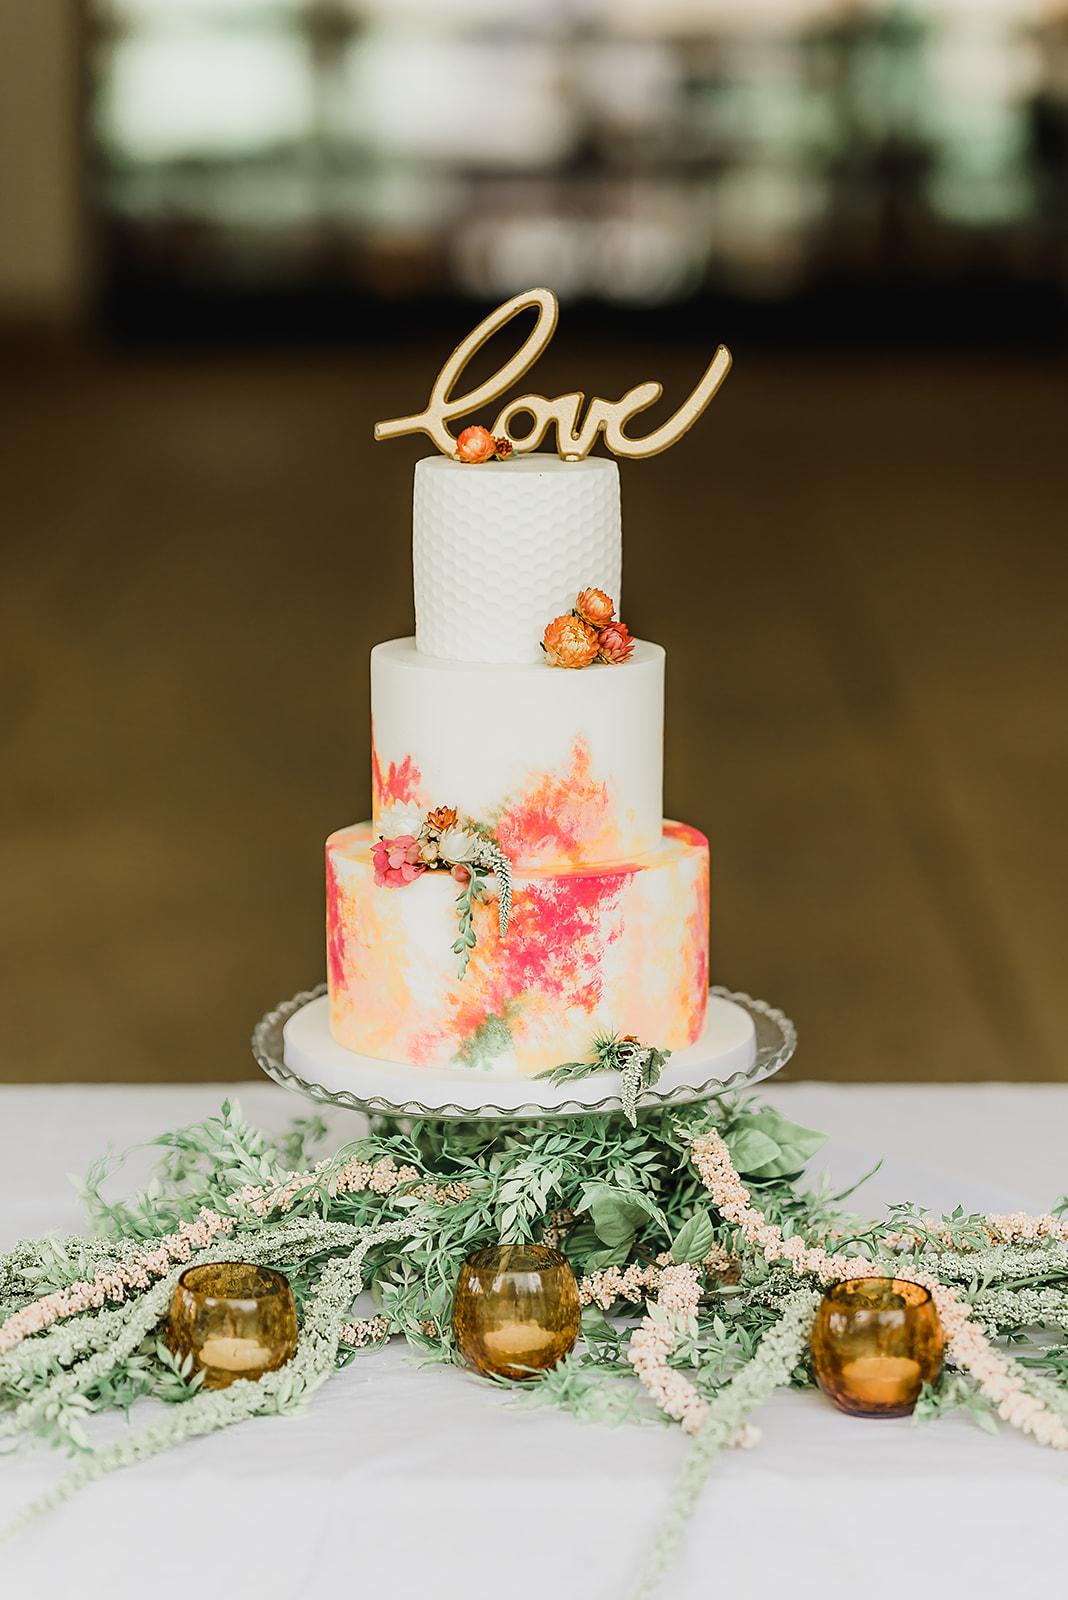 watercolor_honeycomb_stamped_fondant_wedding_ cake_four_oaks_bakery_bespoke_and_beloved_events_pittsburgh_botanic_gardens_summer_wedding